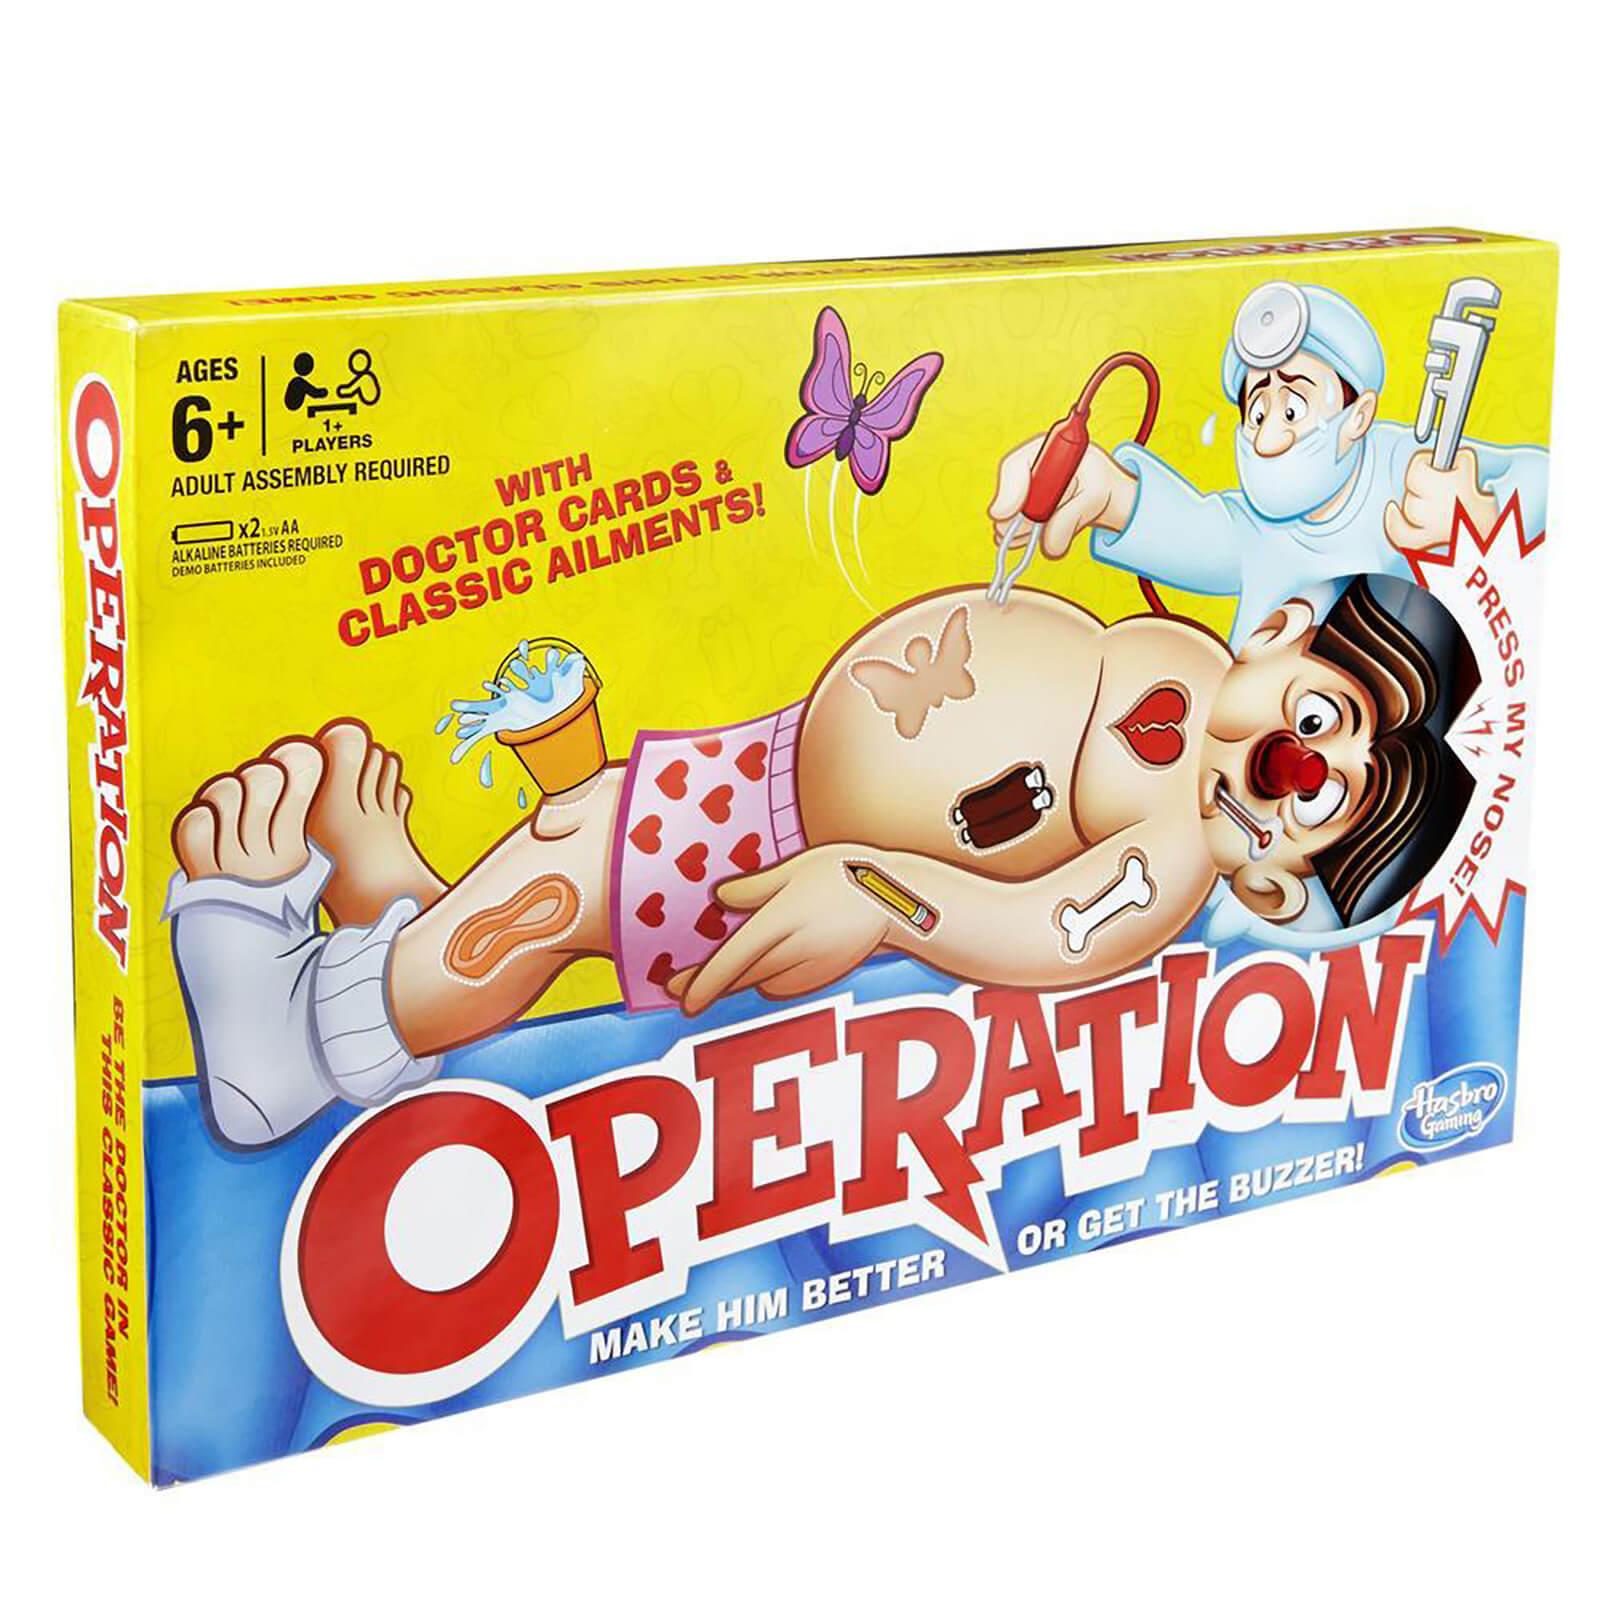 Image of Hasbro Gaming Classic Operation